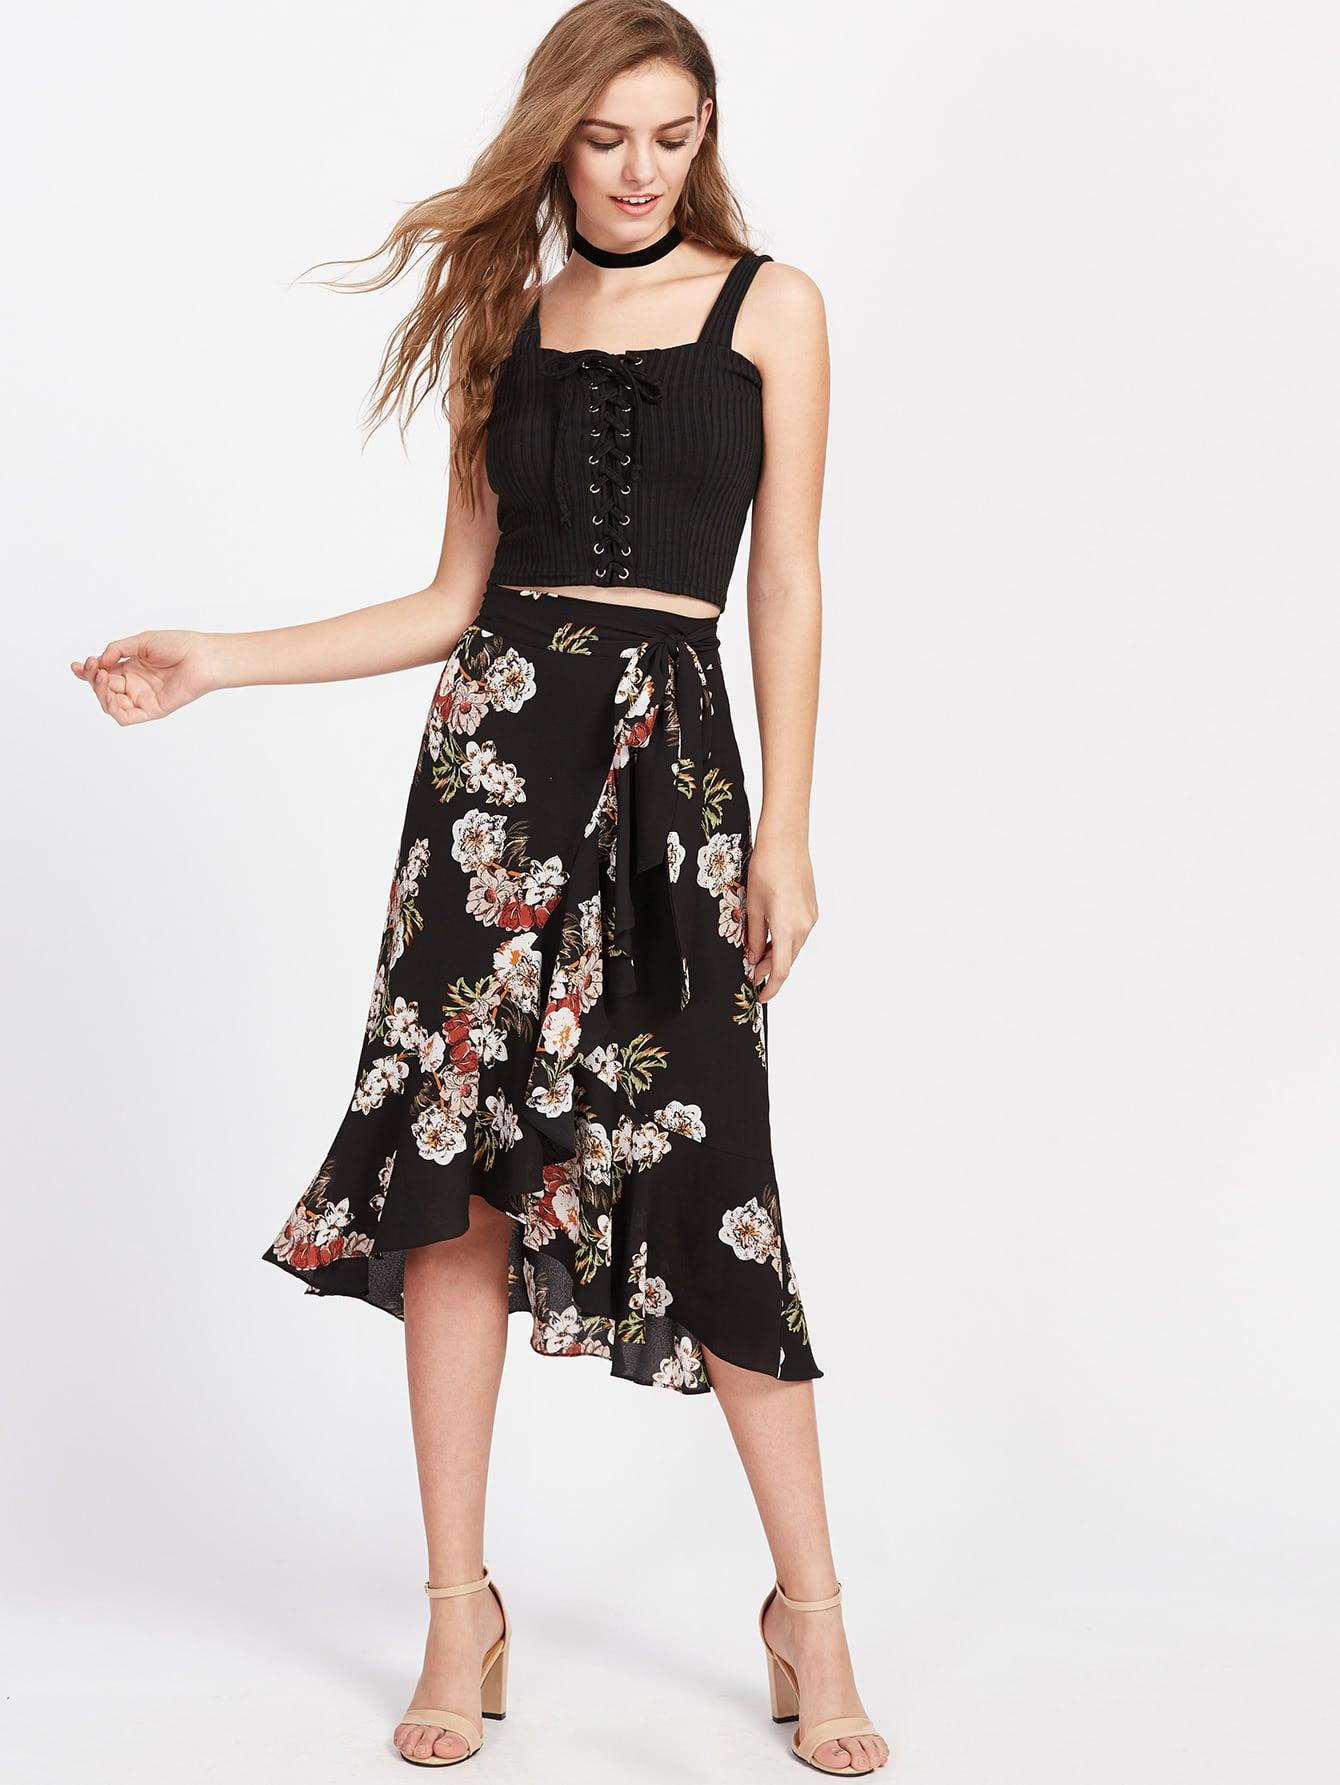 Flower Print Asymmetric Ruffle Wrap Skirt skirt170426703